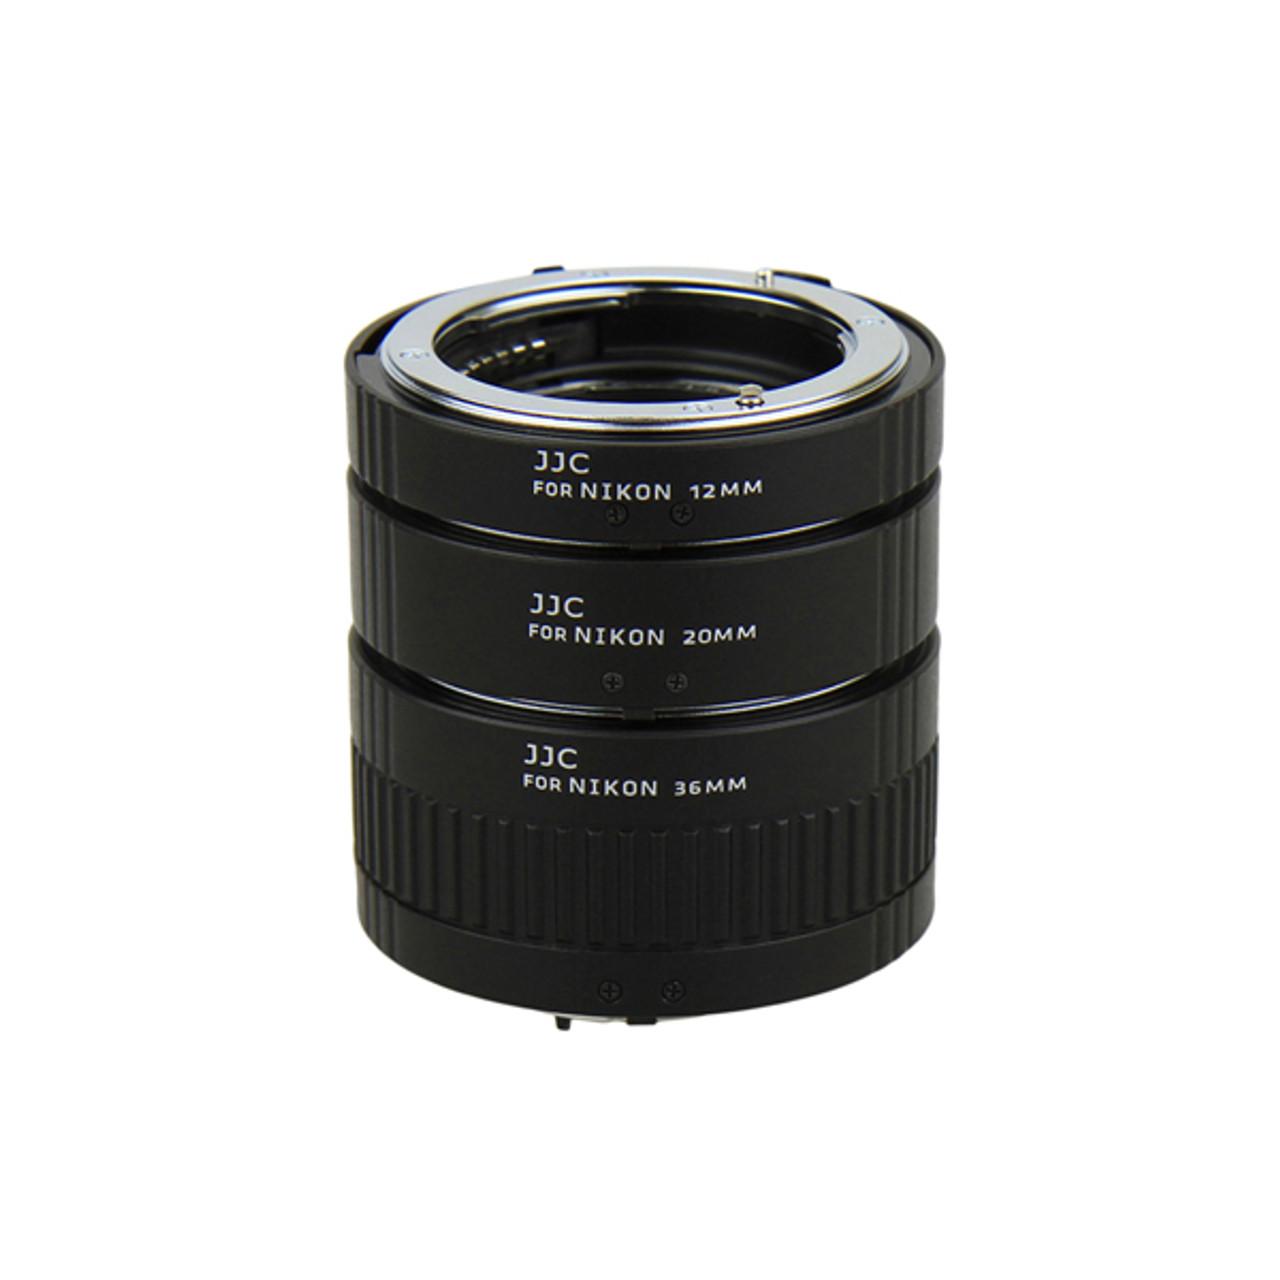 JJC Auto Focus Extension Tube for Nikon F Mount (12mm/20mm/36mm Set)